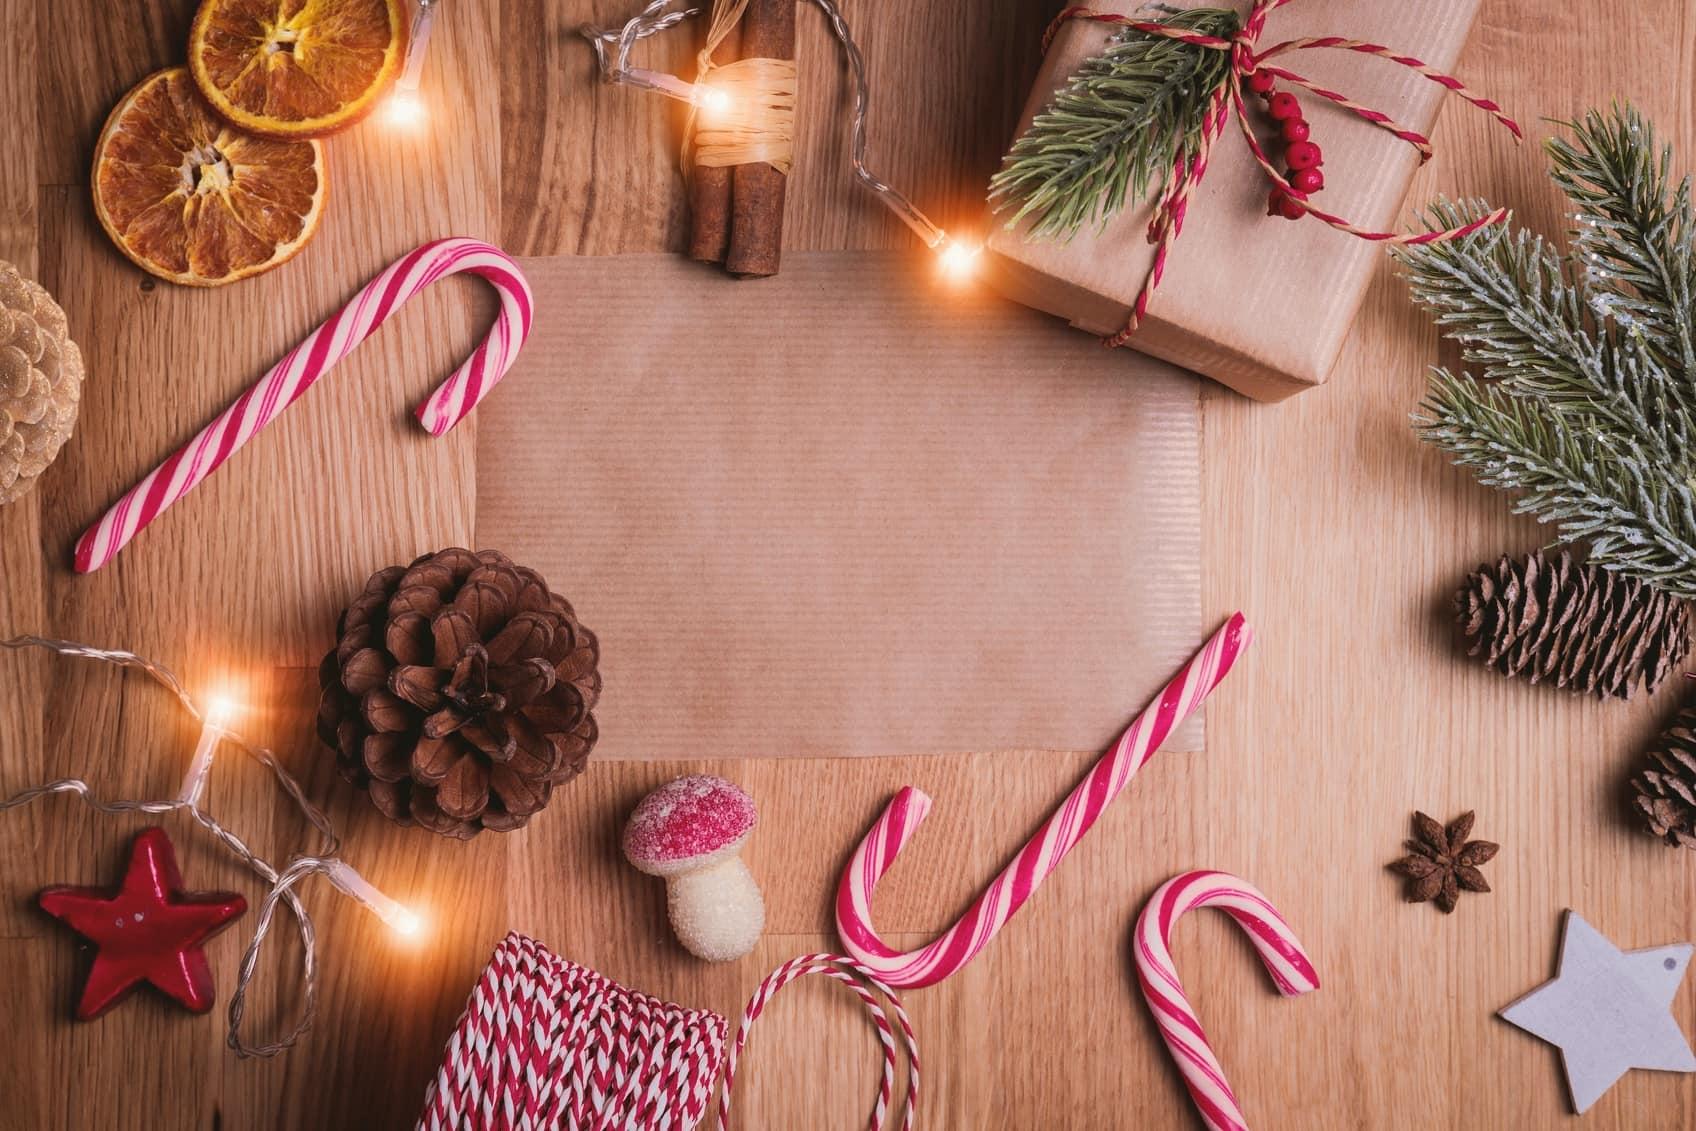 Chèque cadeau Noël : mode d'emploi